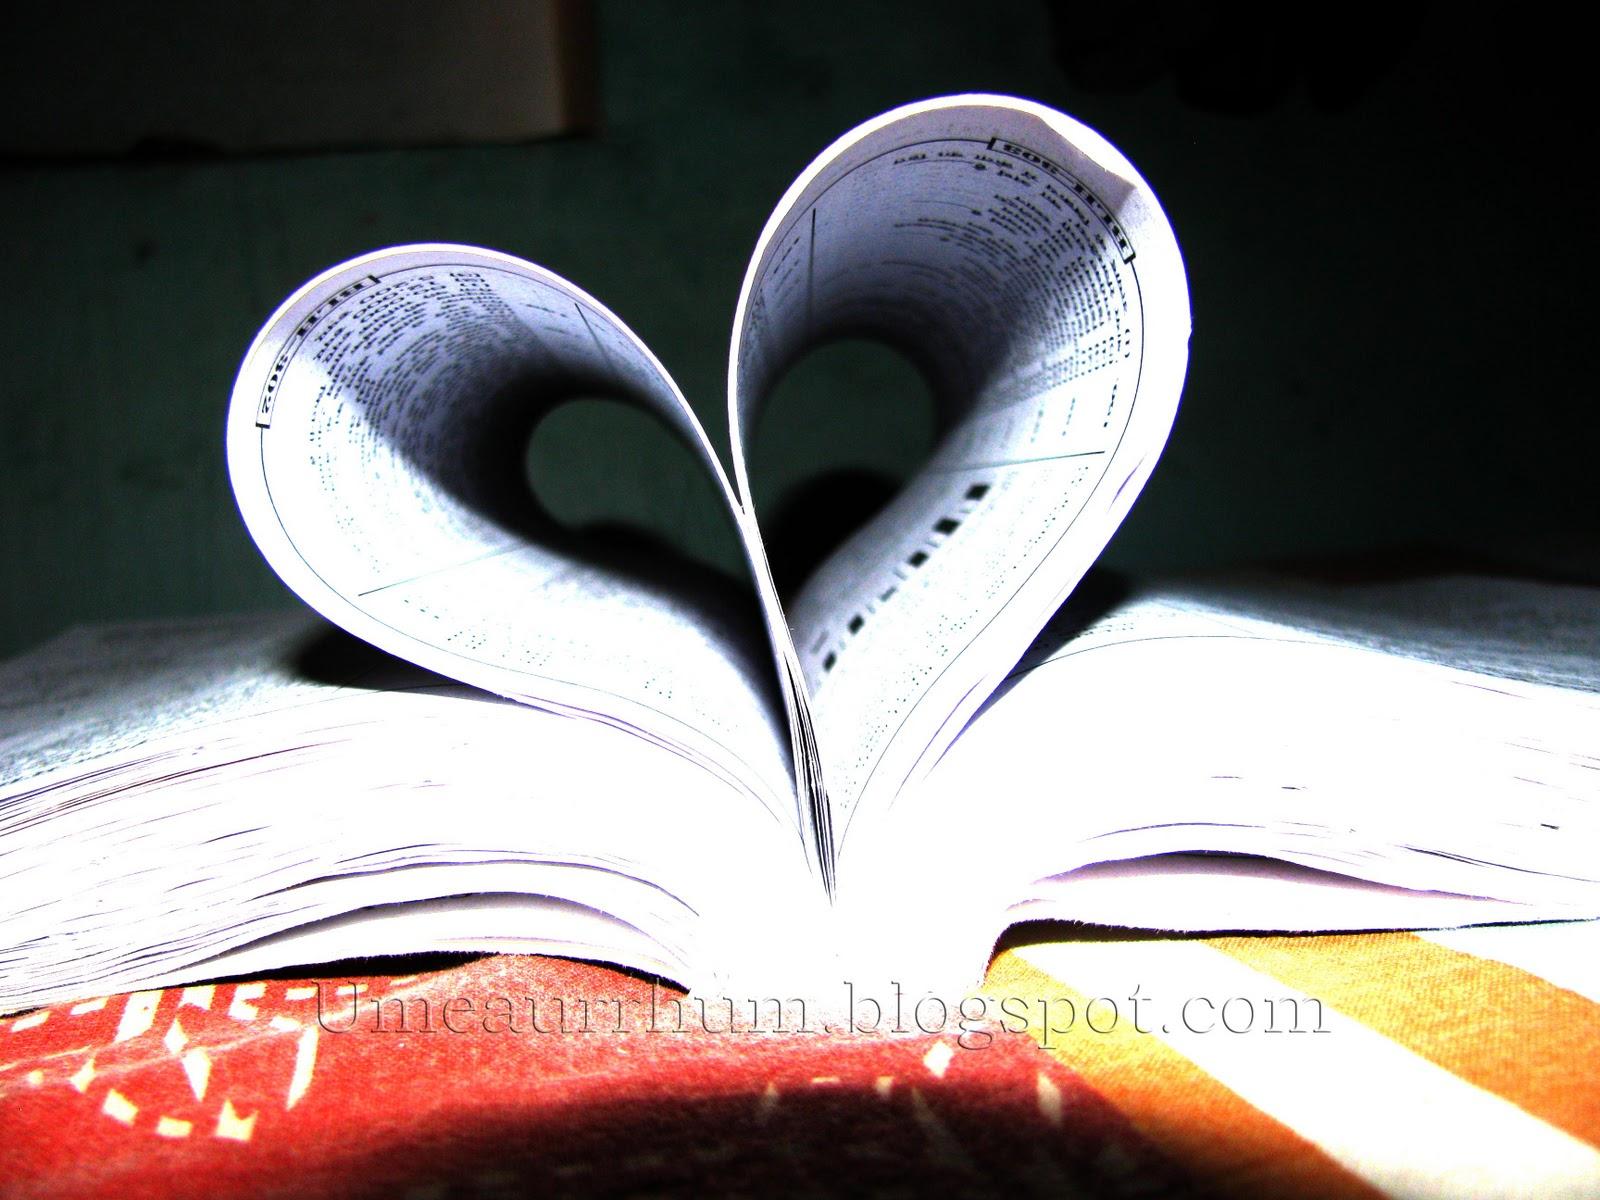 Download love wallpapers - J love wallpaper download ...